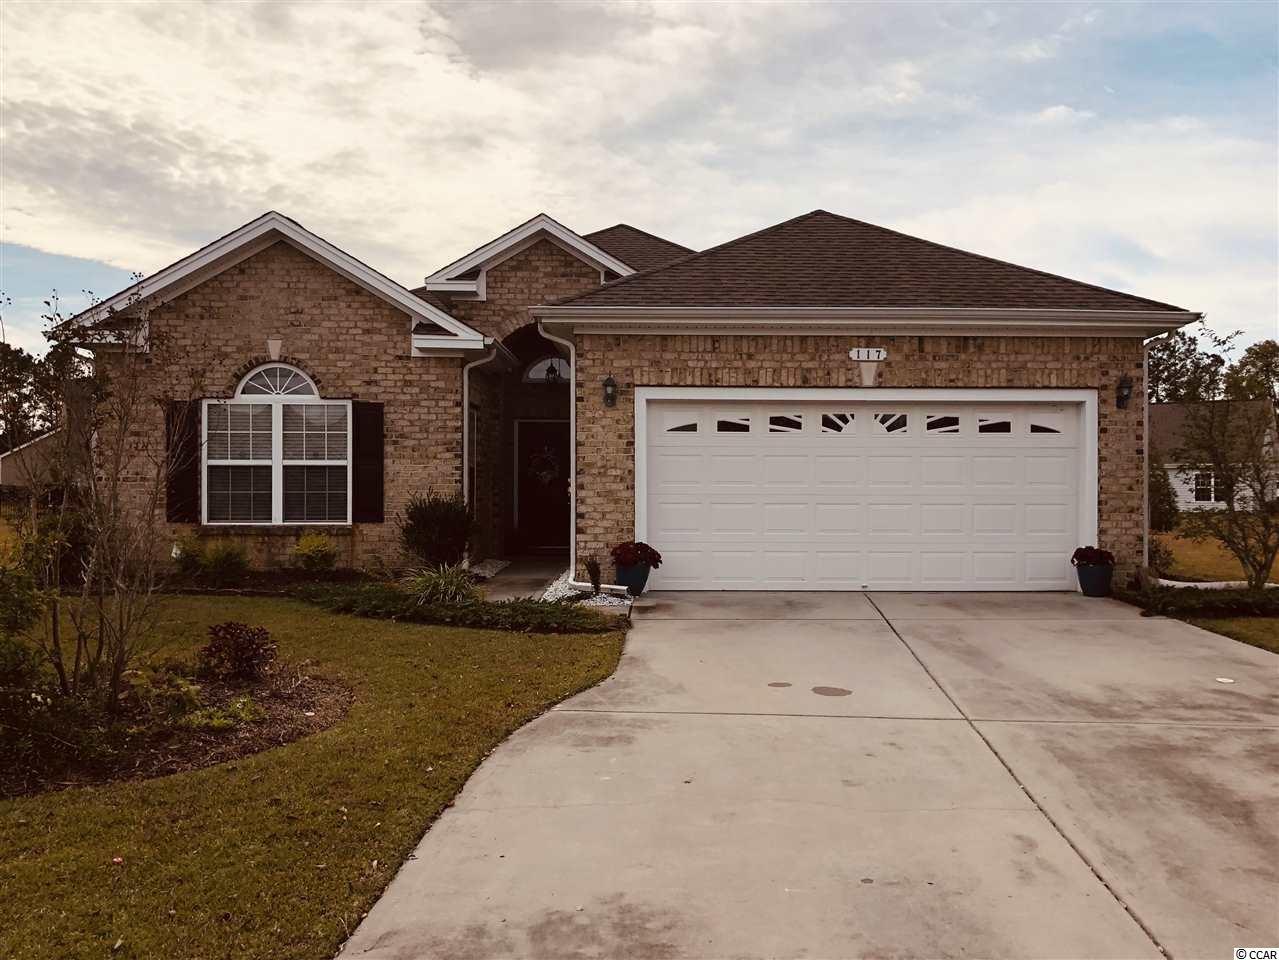 117 Barn Owl Ct., Carolina Shores, NC, 28467, The Farm |Brunswick NC Home For Sale